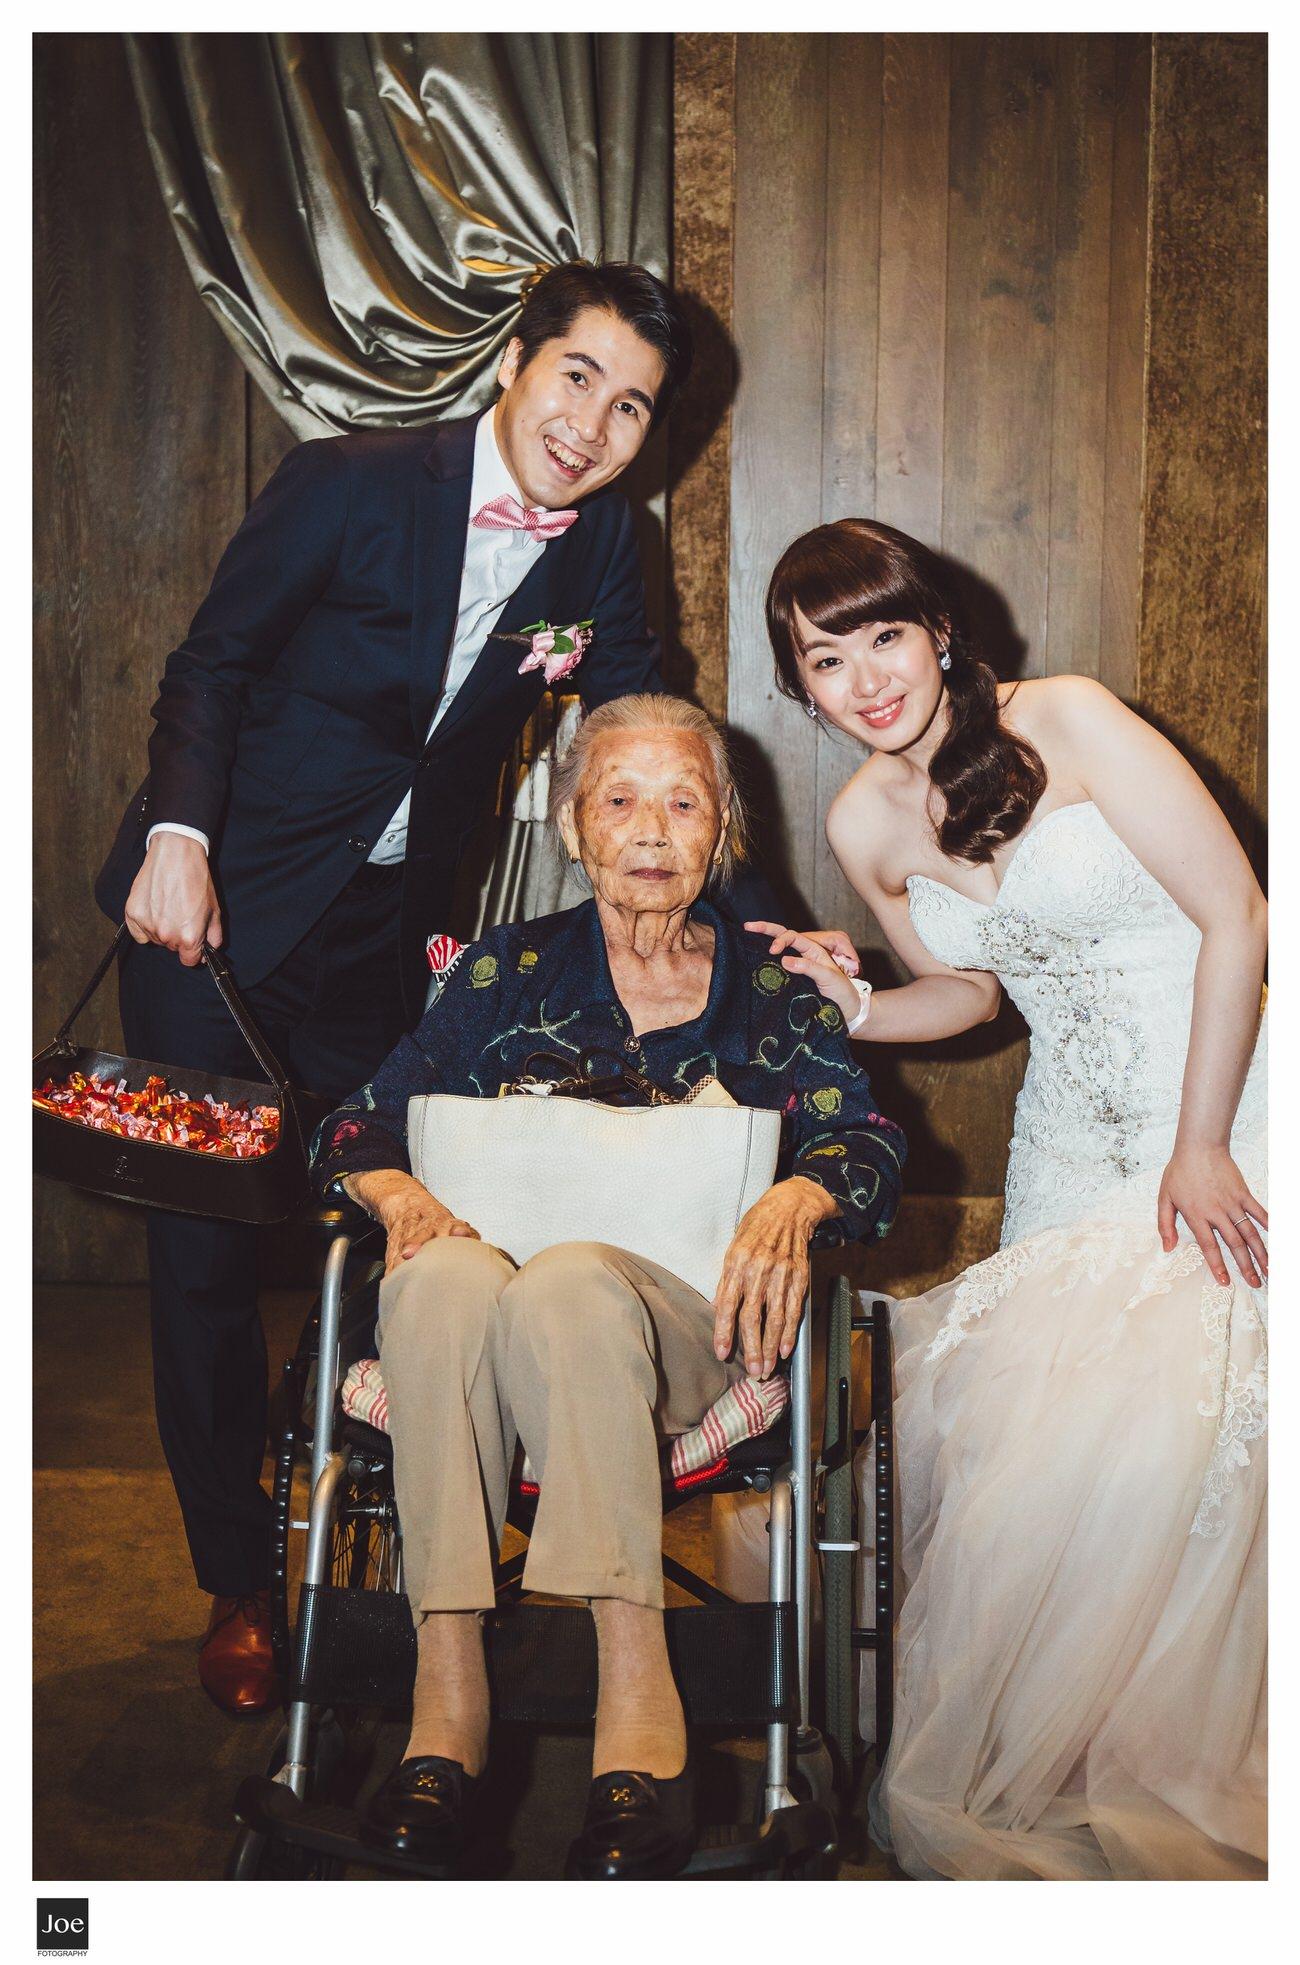 joe-fotography-wedding-photo-palais-de-chine-hotel-068.jpg